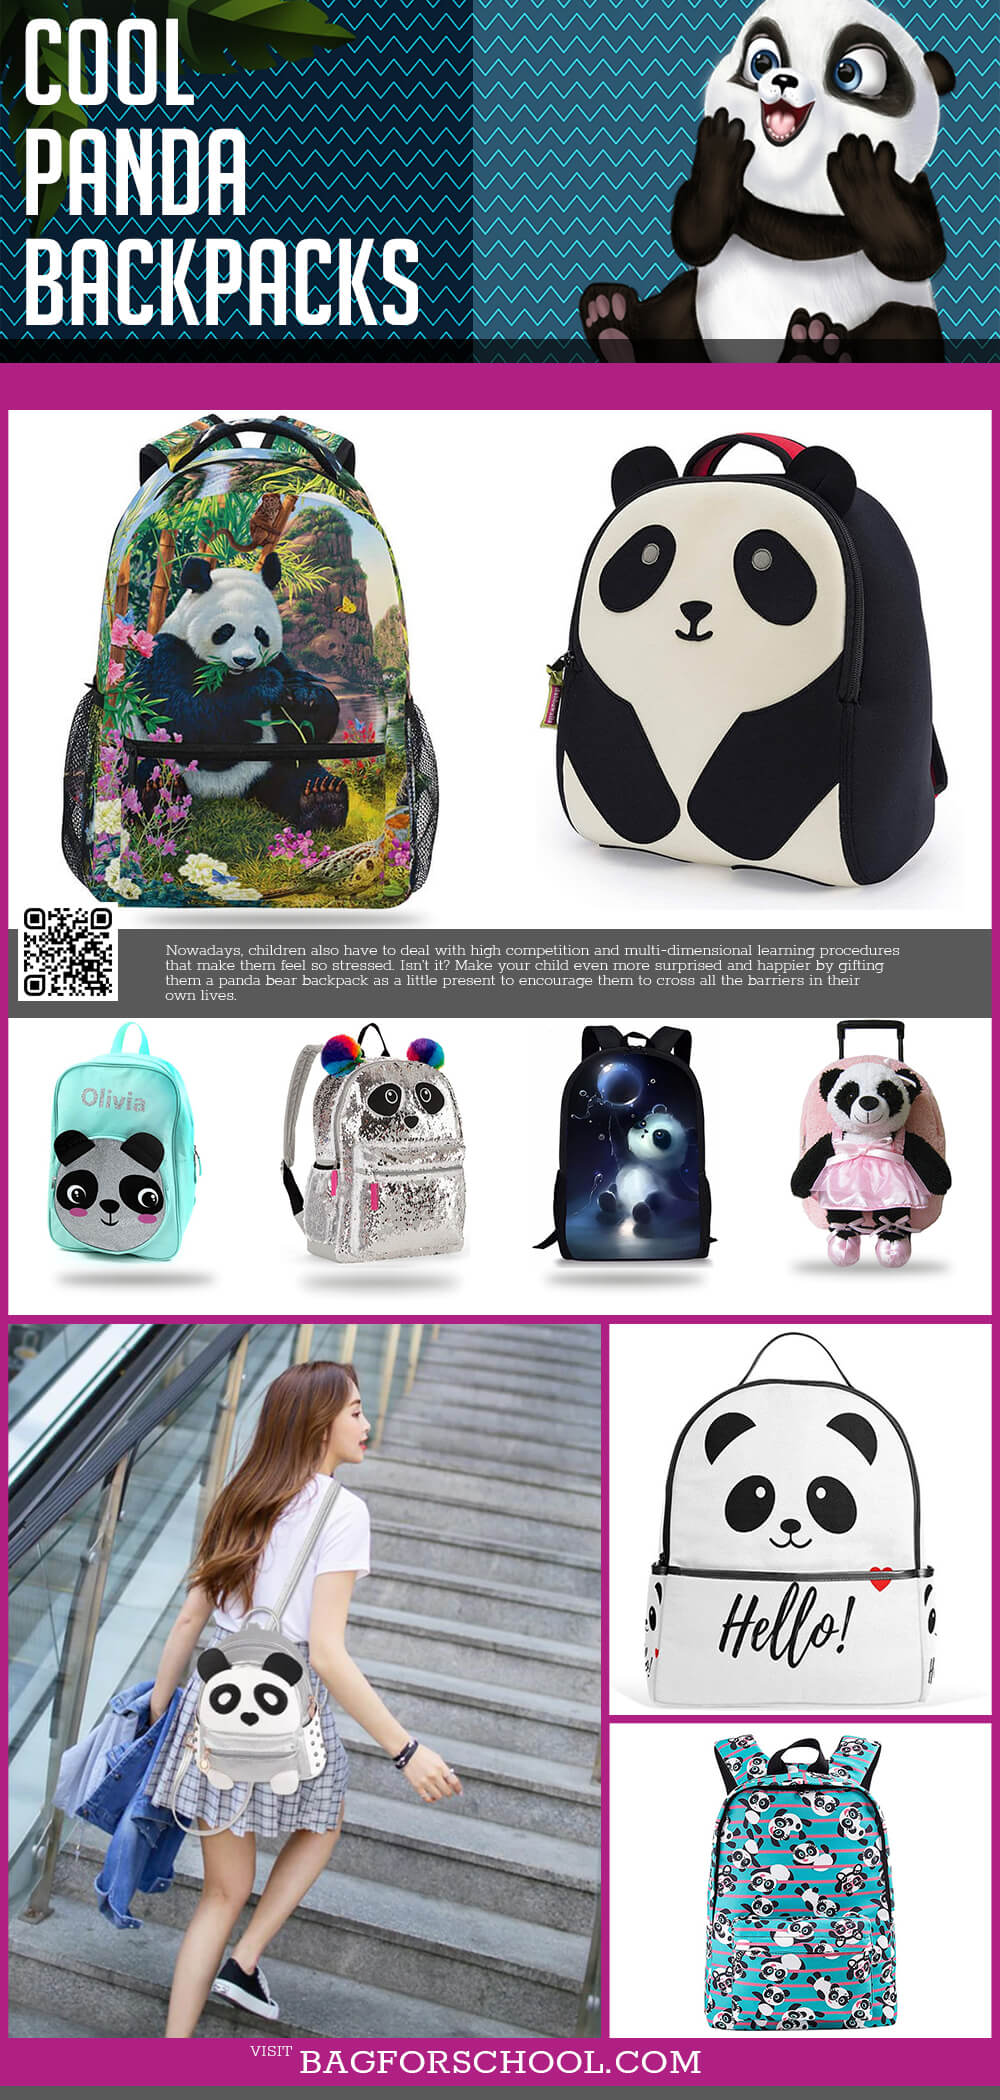 Panda Backpacks